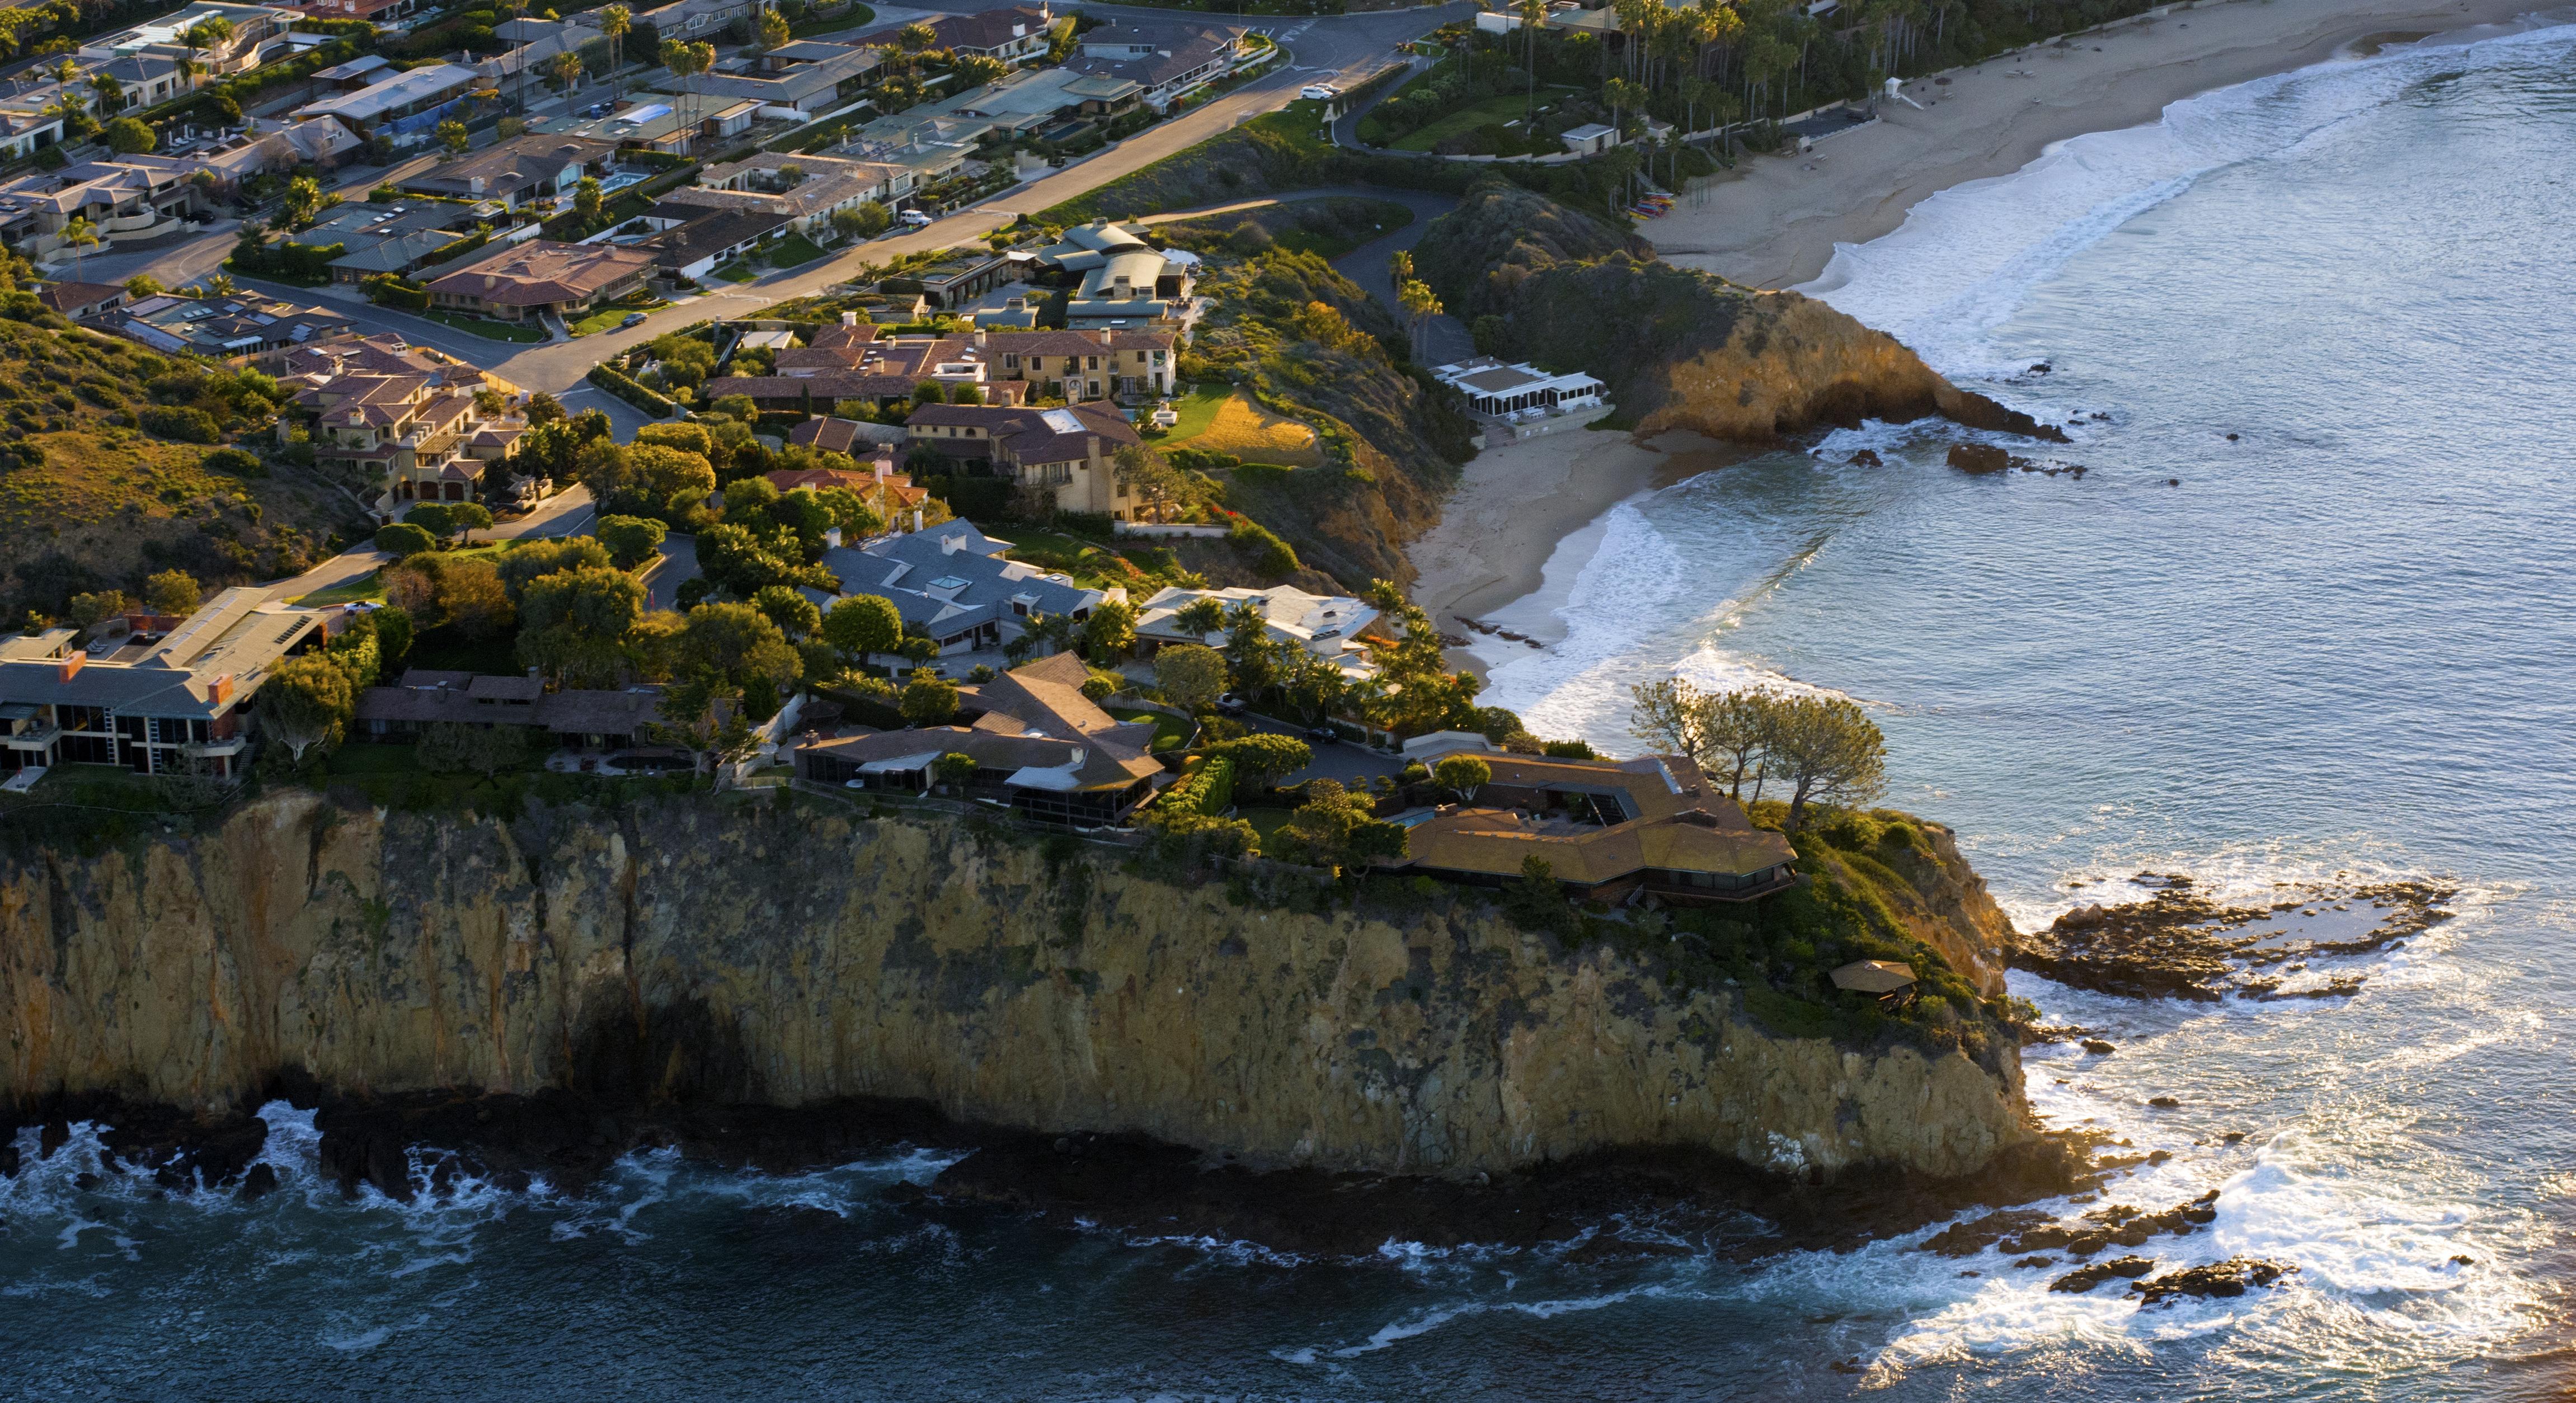 abalone_point_laguna_beach_california_photo_d_ramey_logan